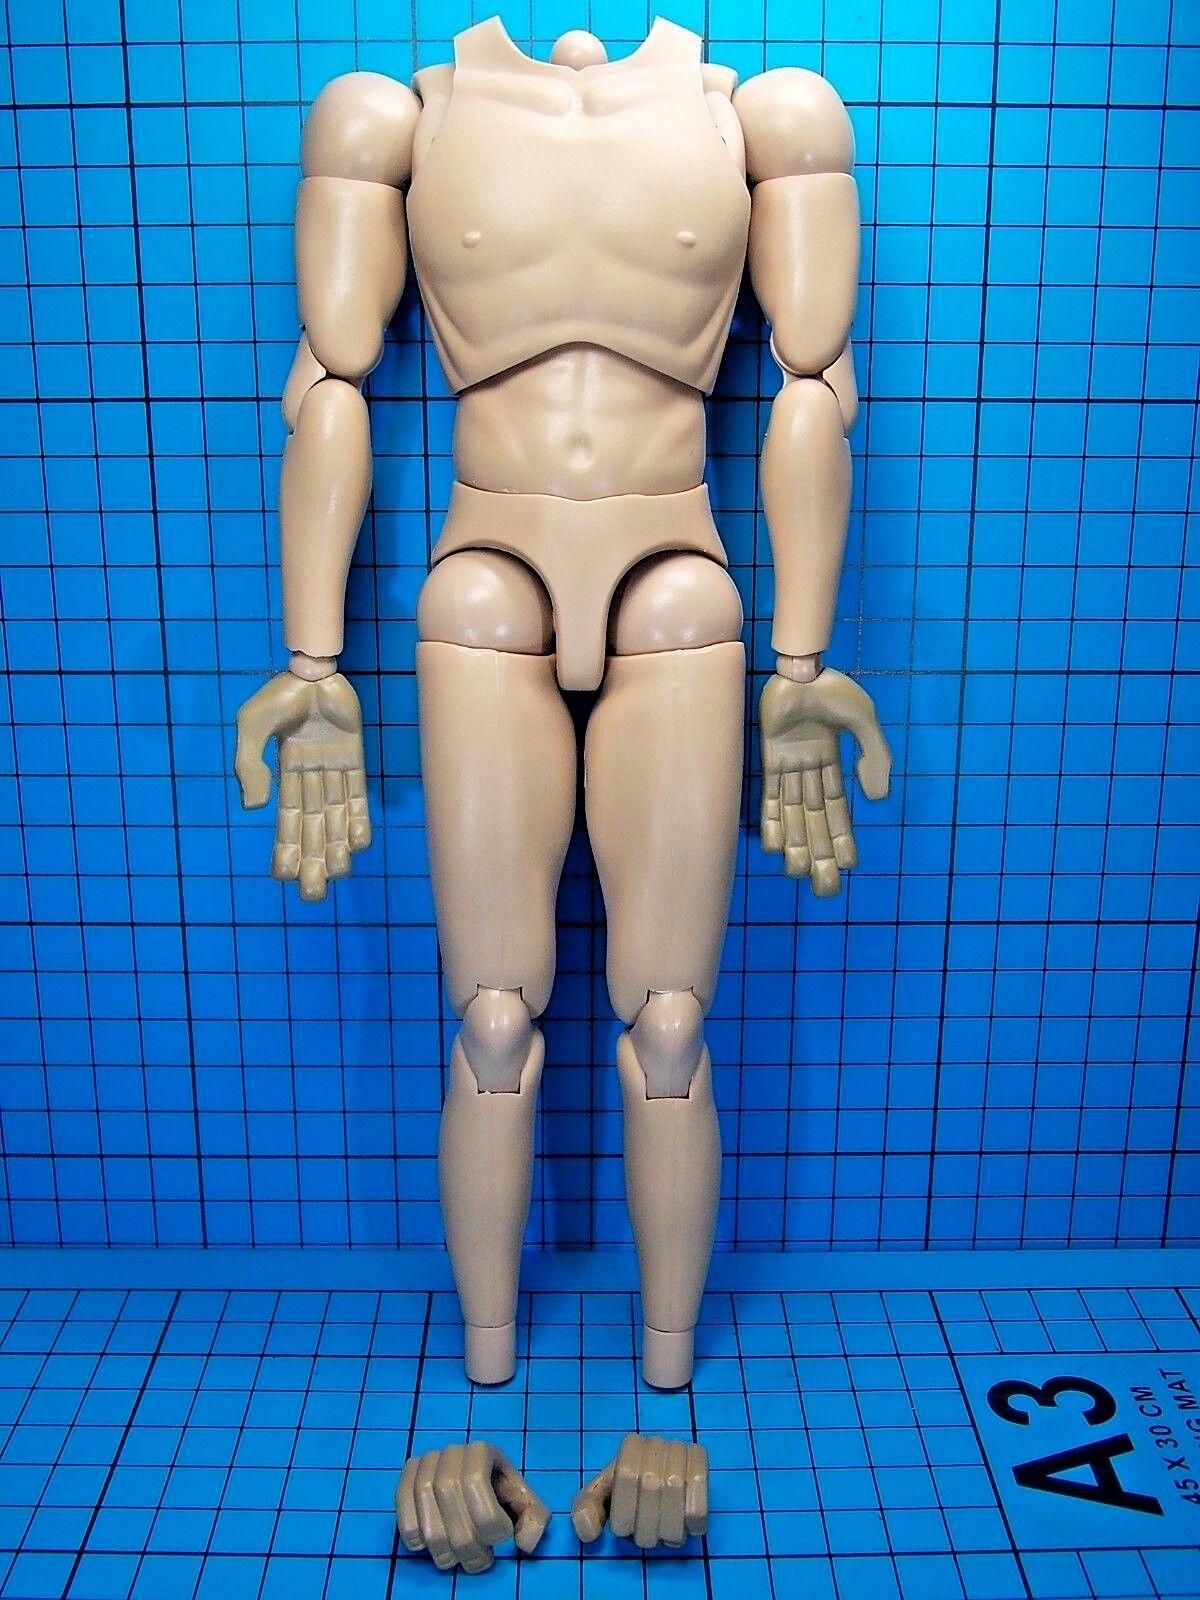 ACI x Jason Siu 1 6 Primates In Concrete Jungle Figure - Brad Muscular Body